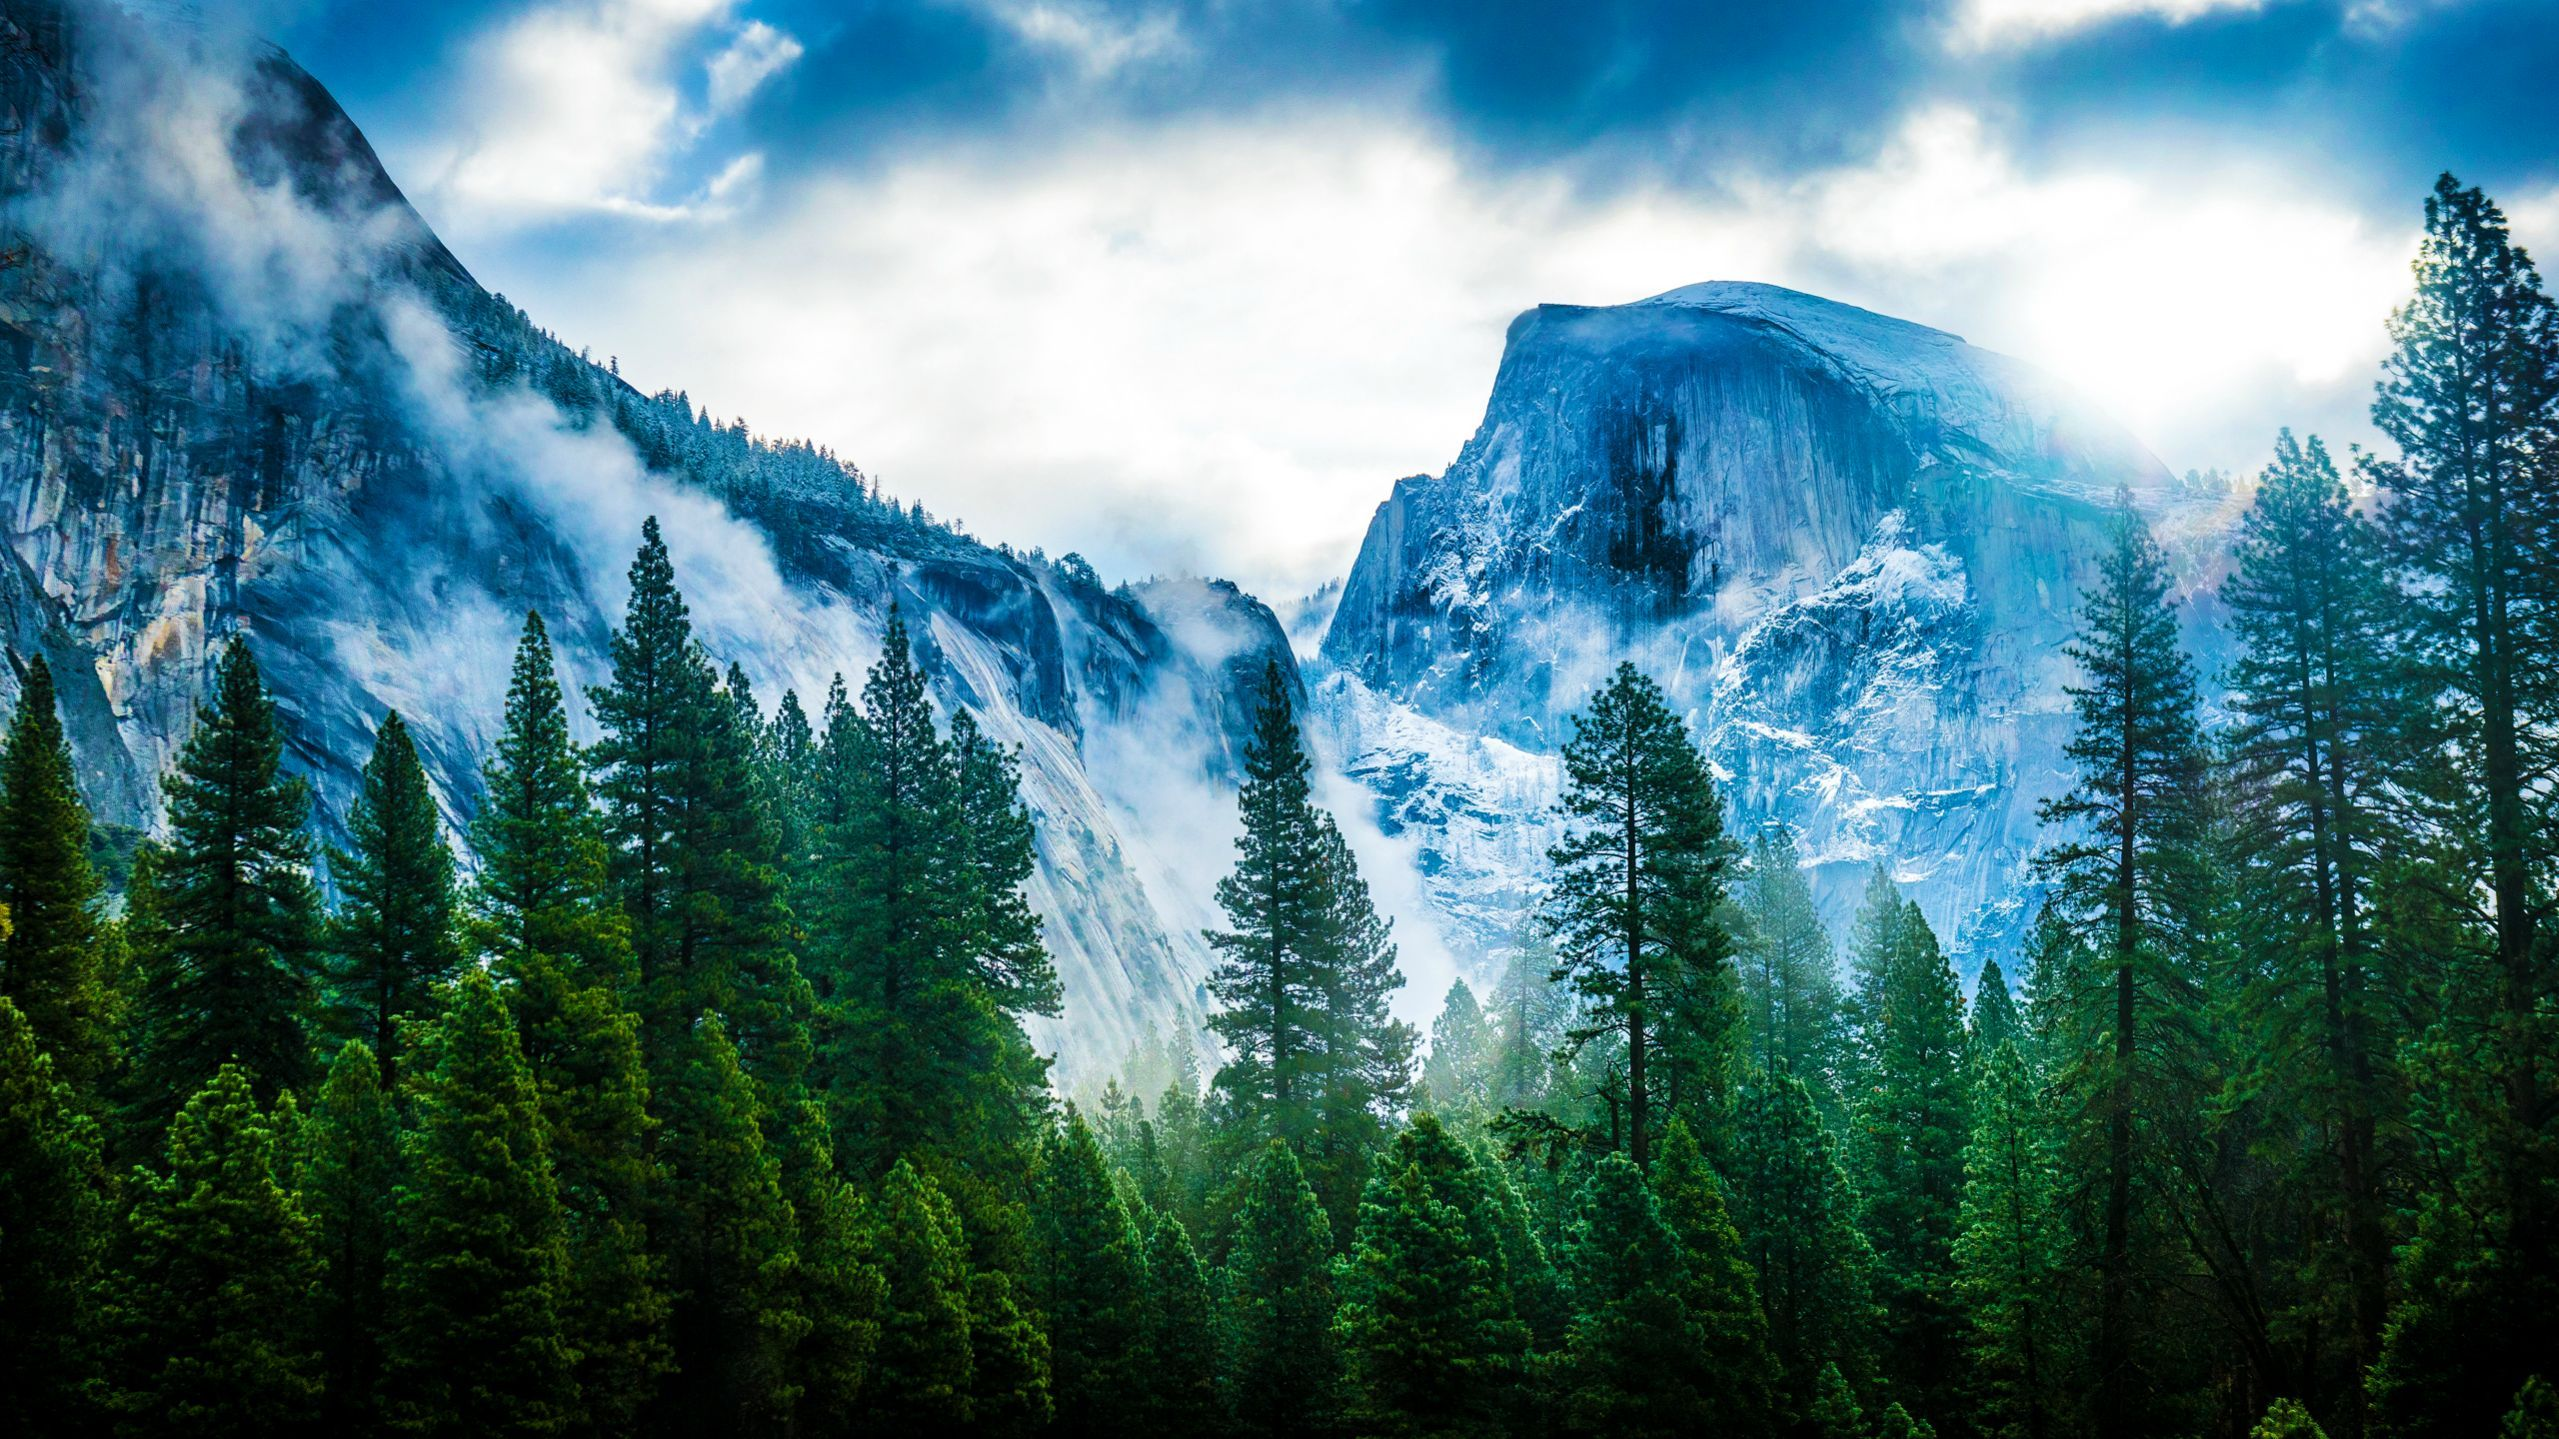 Great Wallpaper Mountain Google - cd1eb6652f3dfa861bd4127c38c693d2  Photograph_436569.jpg